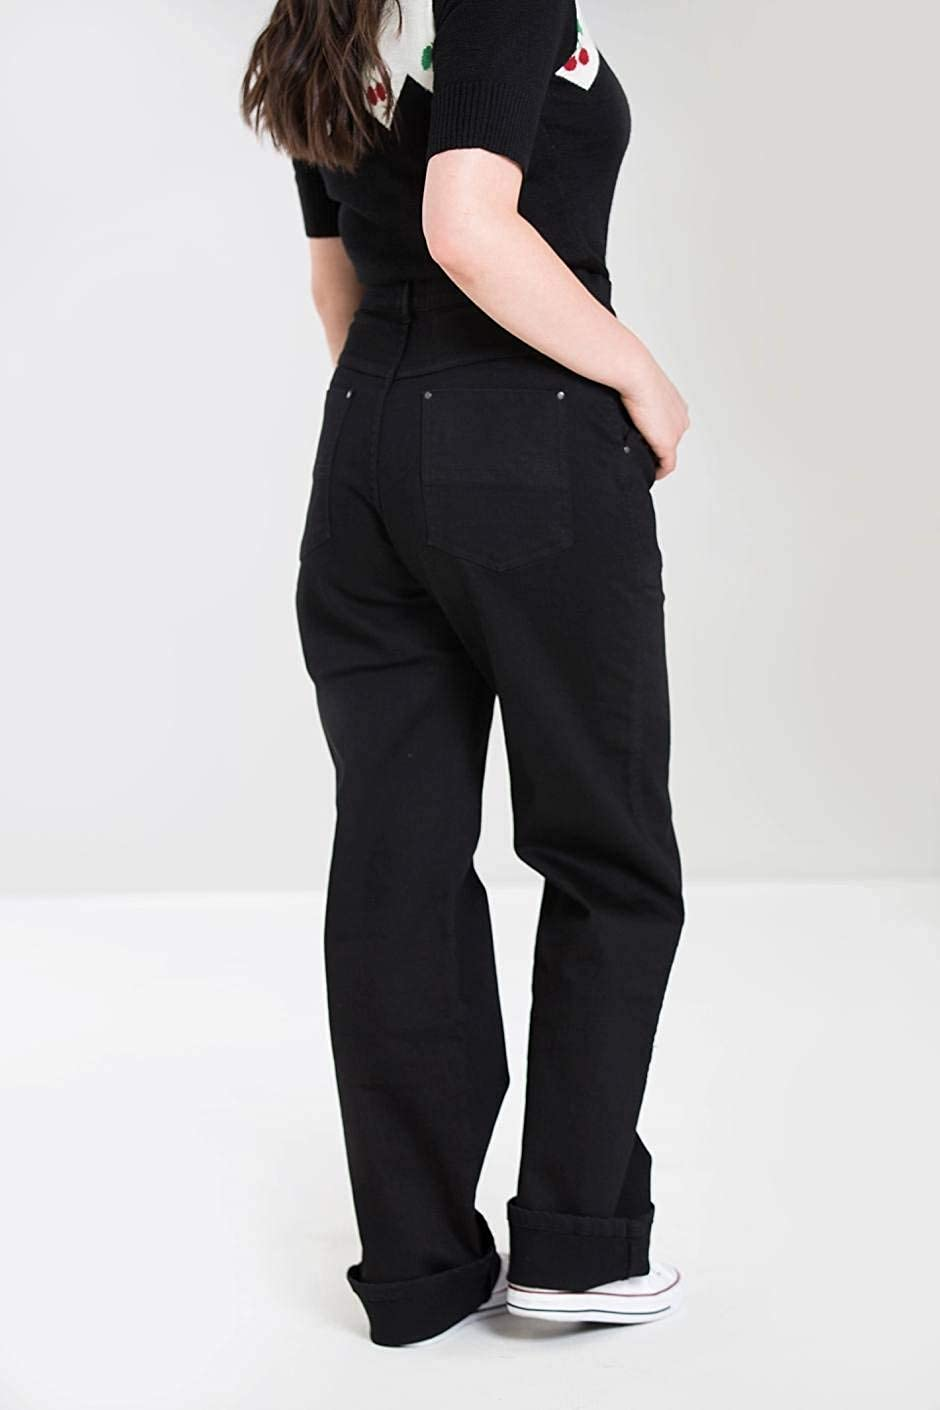 Hell Bunny Weston Anni 40 Stile Rockabilly Denim Jeans